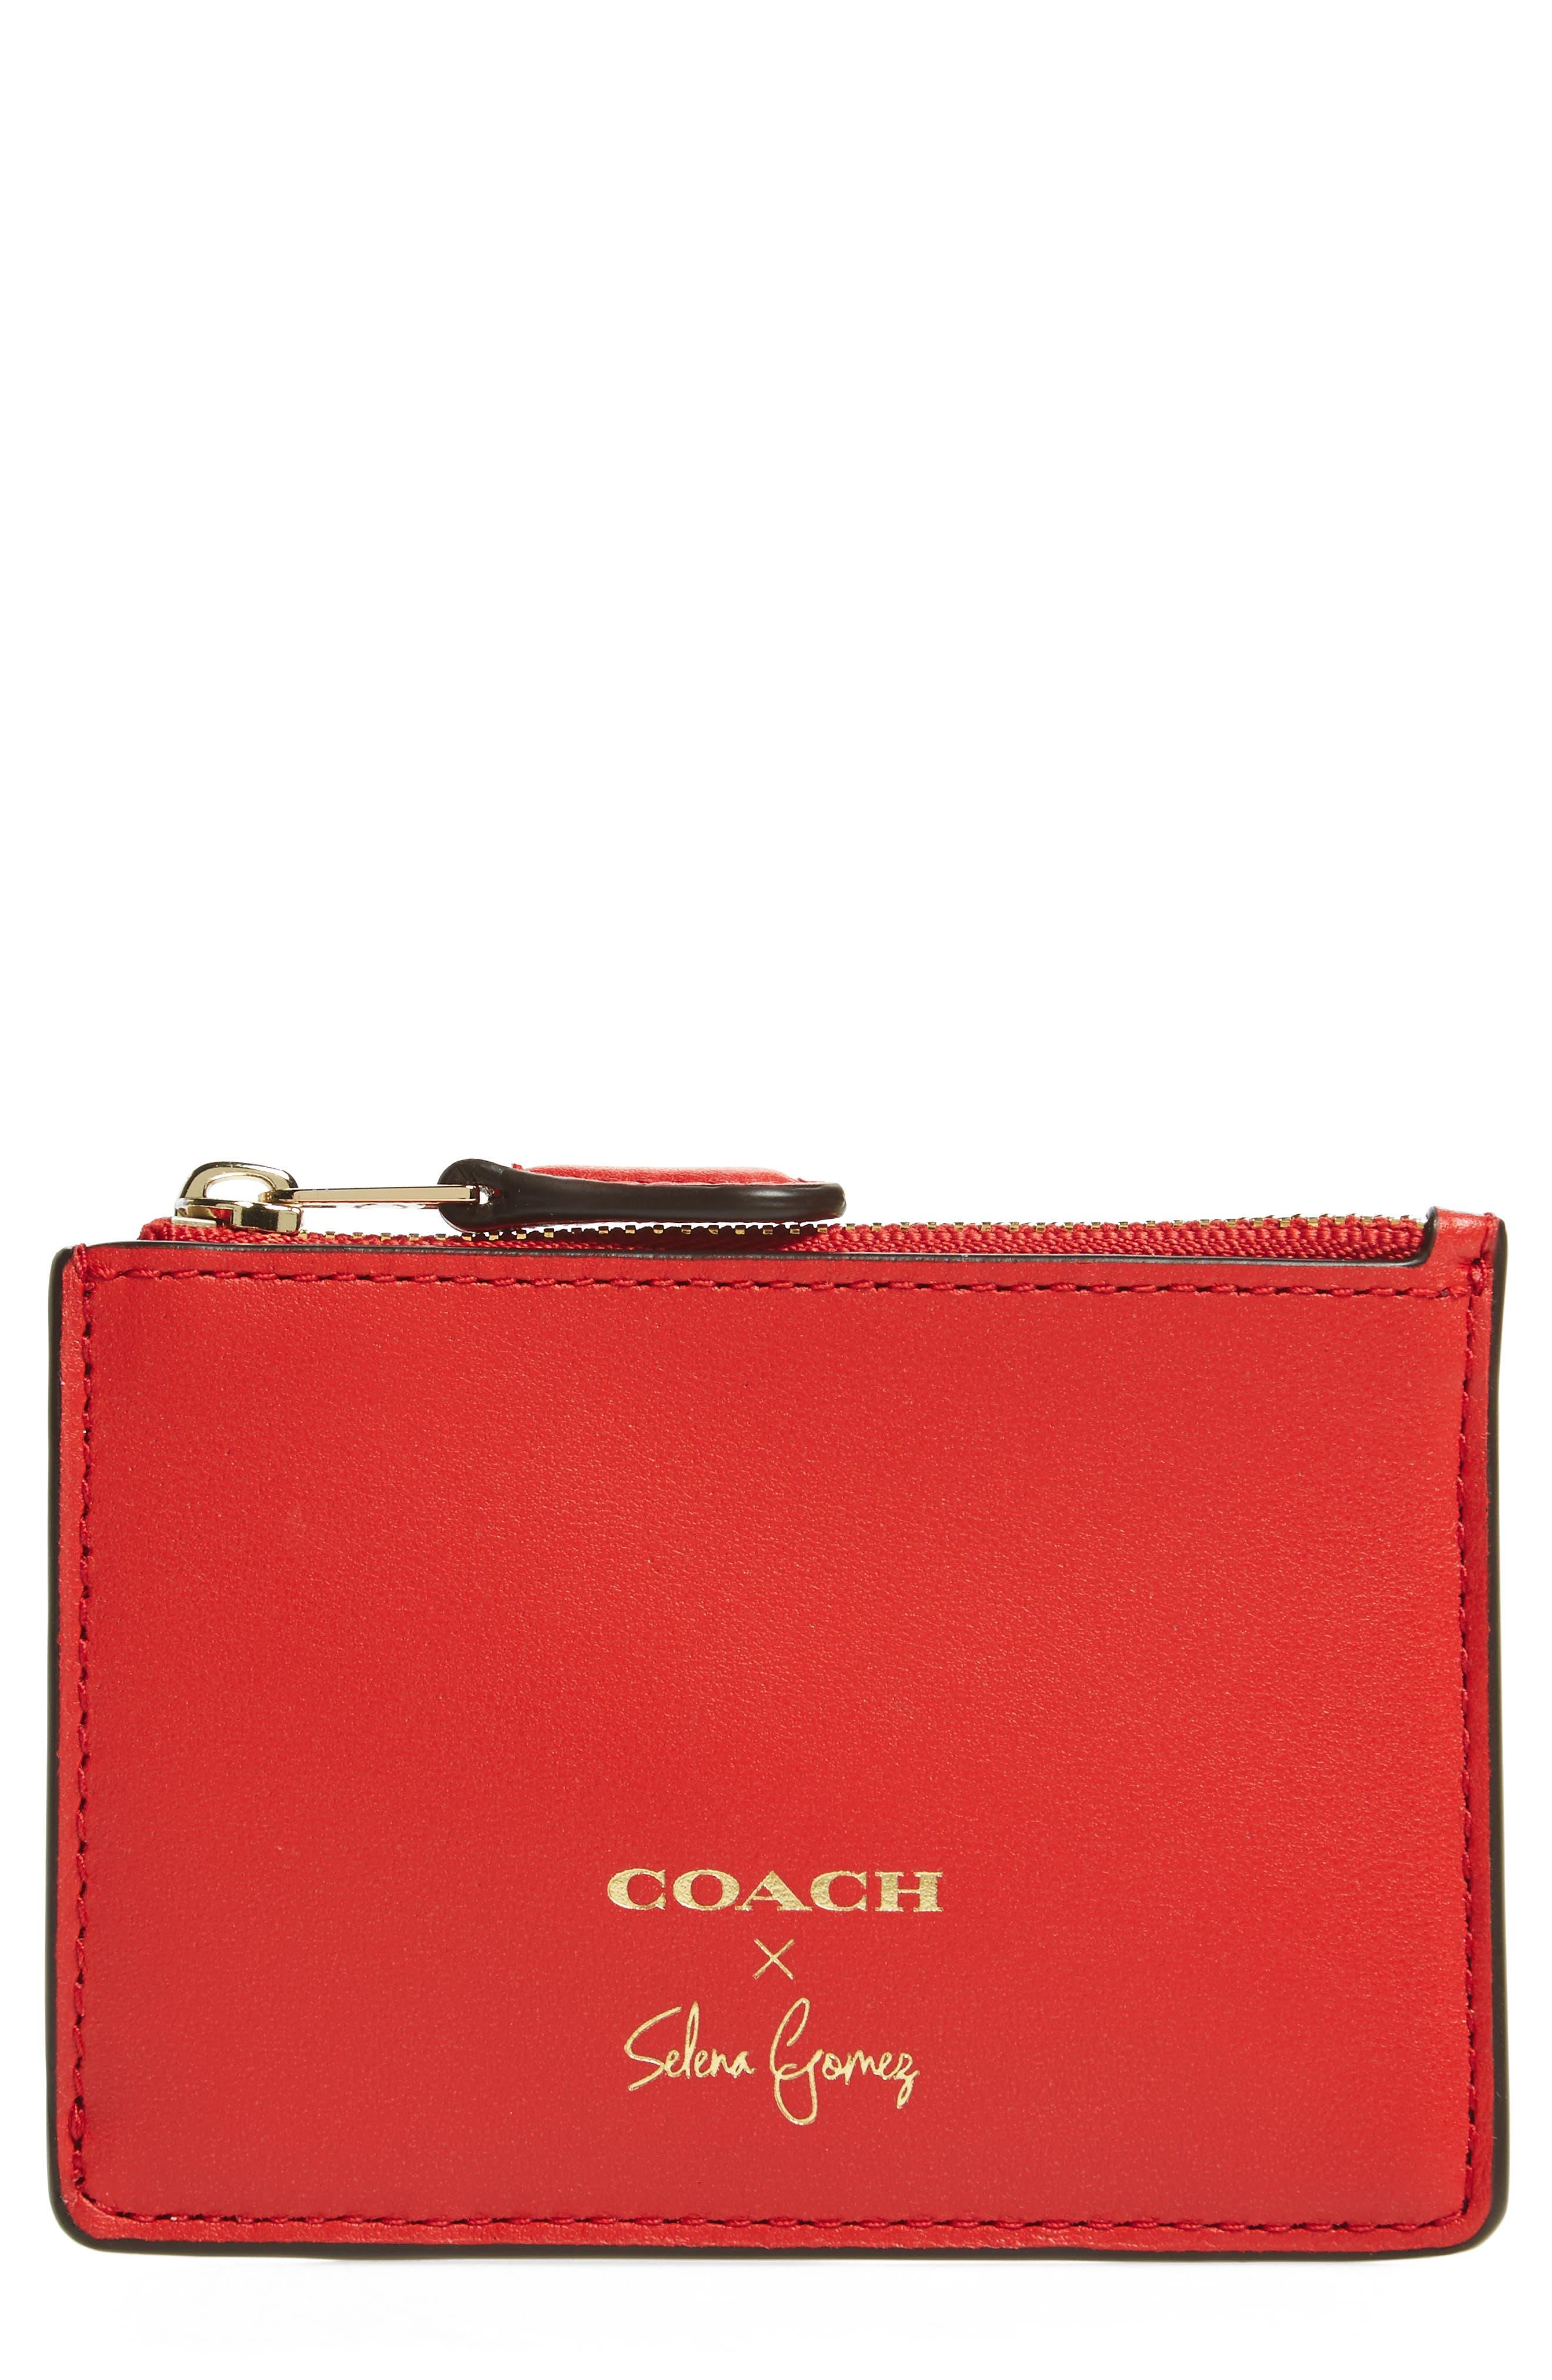 COACH x Selena Gomez Mini Skinny Leather Card Case